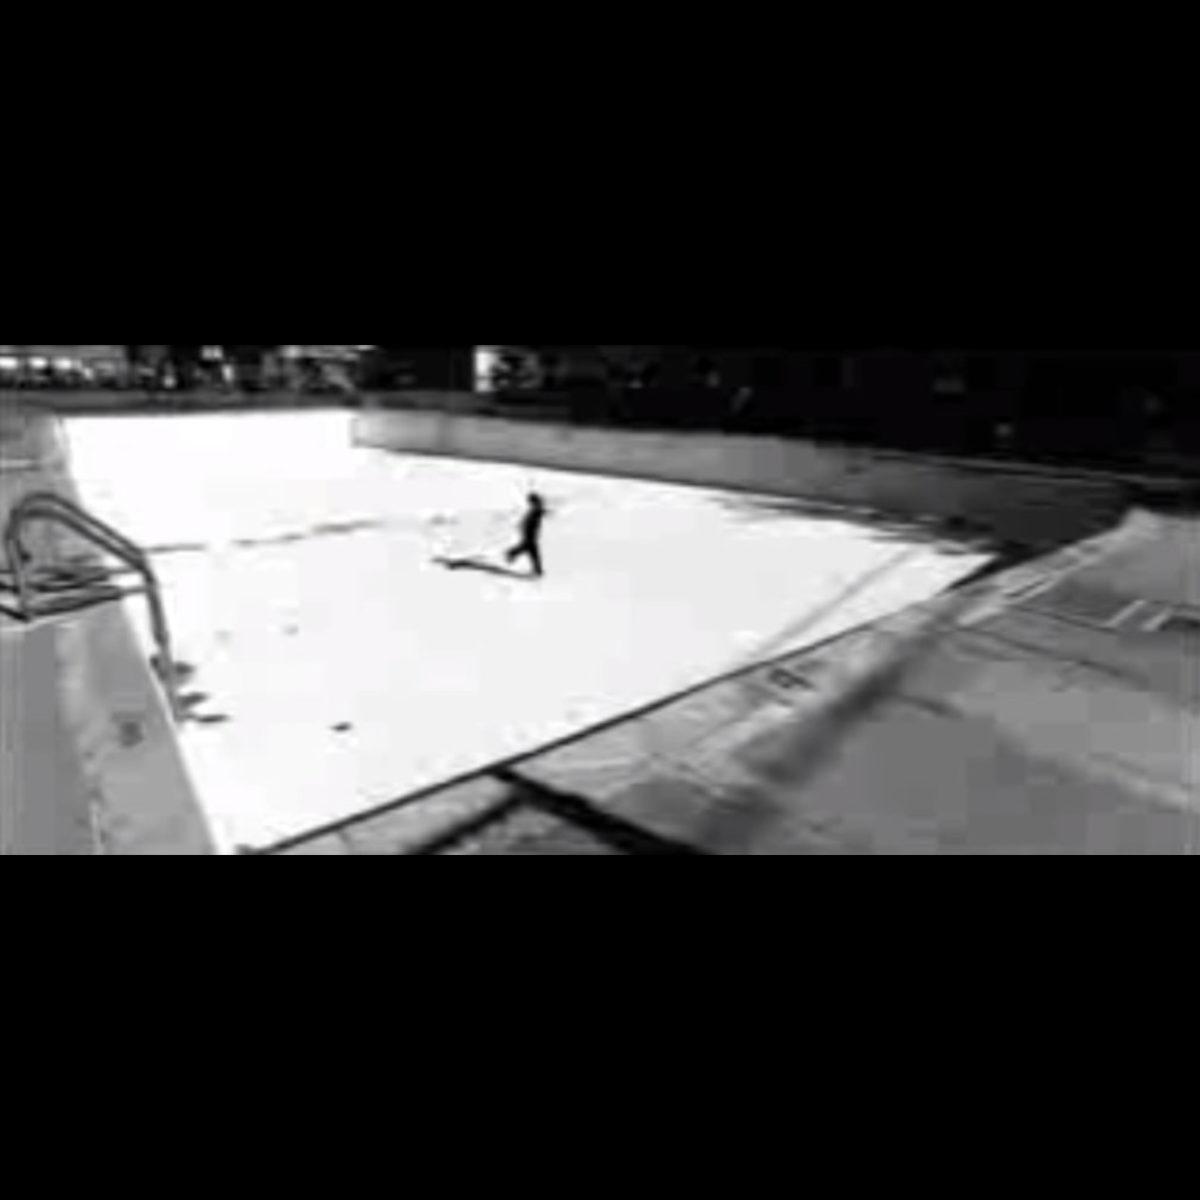 Jay-Z - Young Forever (ft. Mr. Hudson) (Thumbnail)